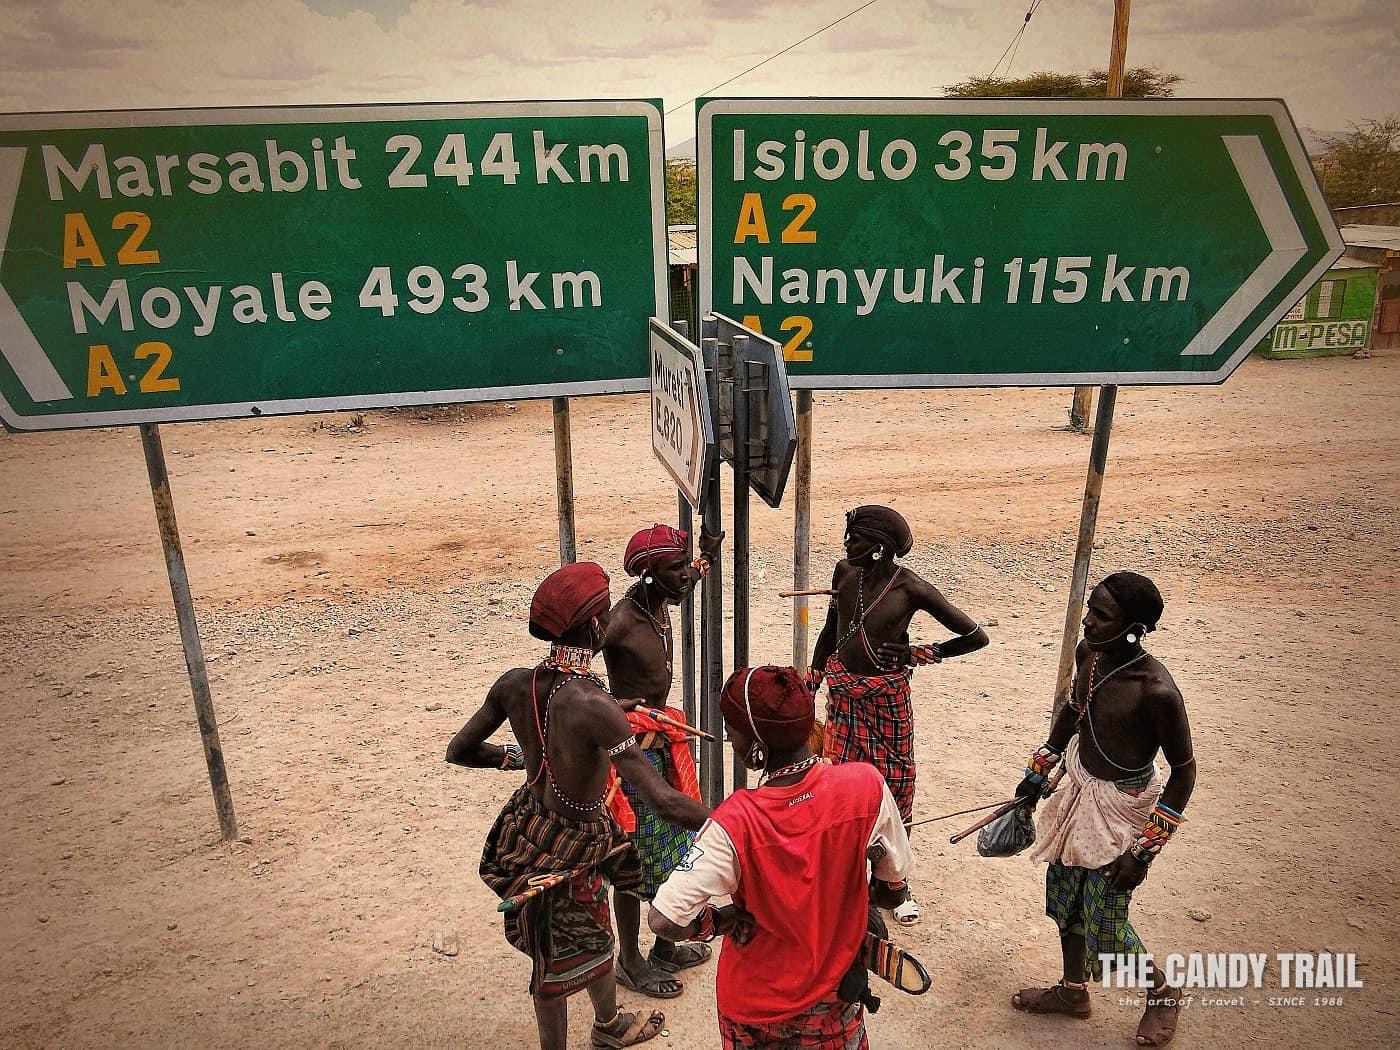 samburu warriors on route moyale marsabit kenya